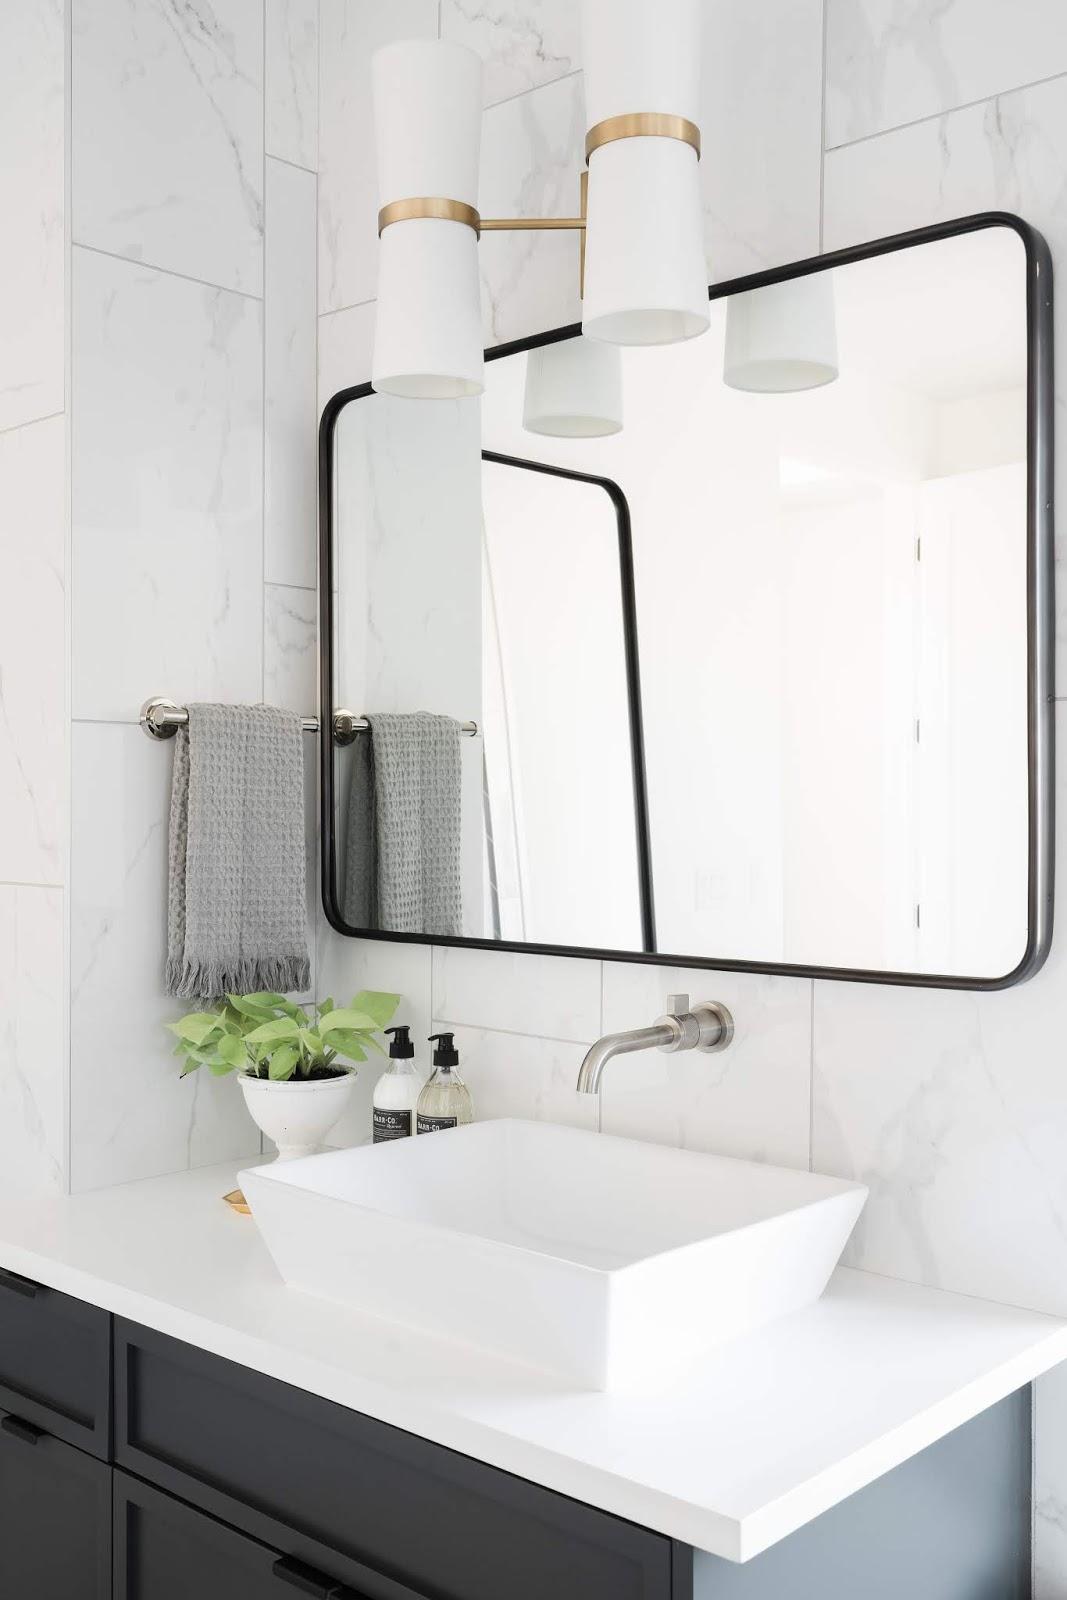 Modern Bathroom Sink, Gold Bathroom accessories